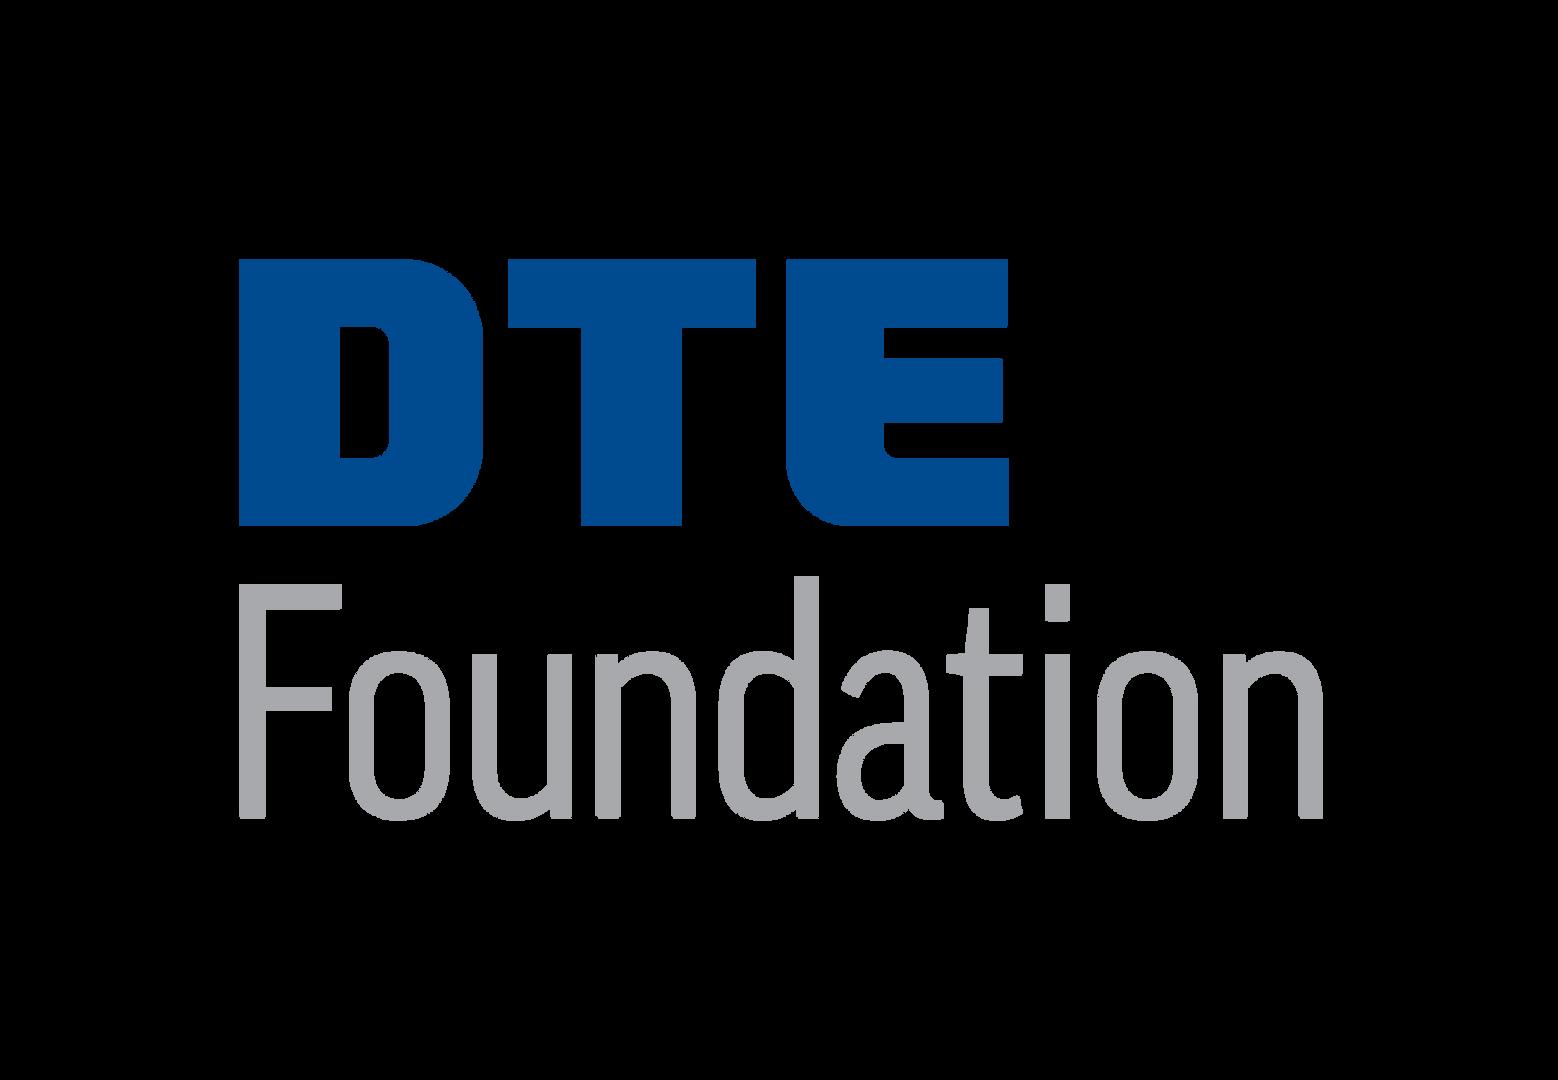 DTE_Foundation_Vertical_CMYK_Coated-01.p